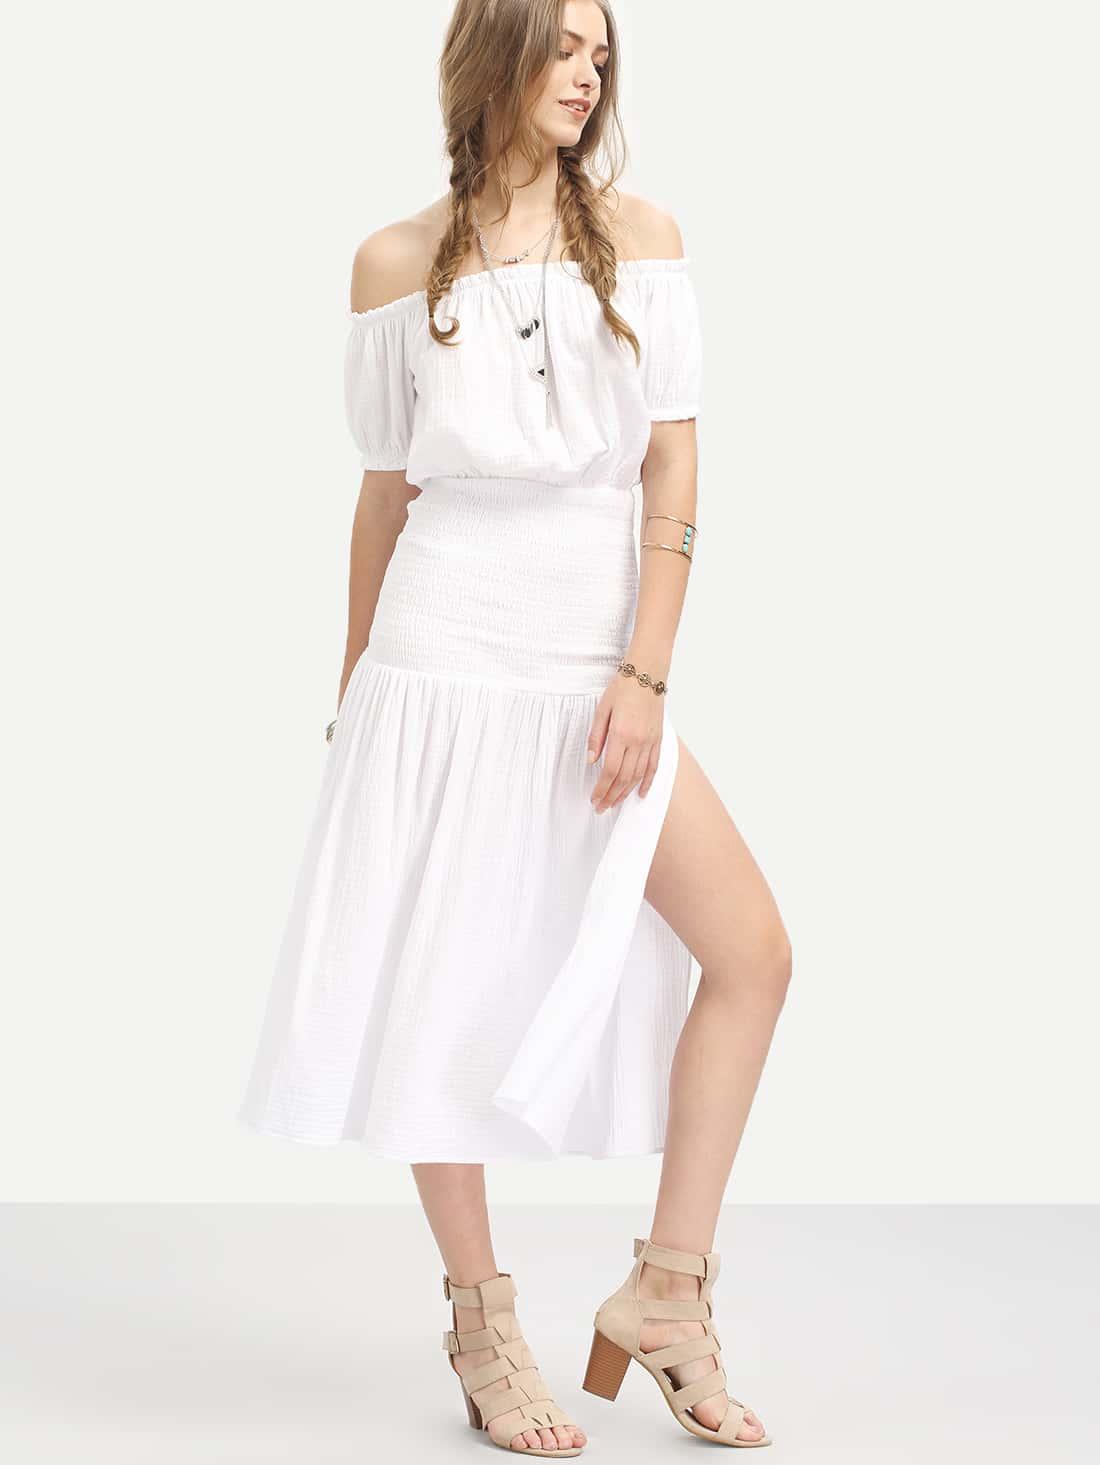 White Off The Shoulder Split Side Midi DressWhite Off The Shoulder Split Side Midi Dress<br><br>color: White<br>size: M